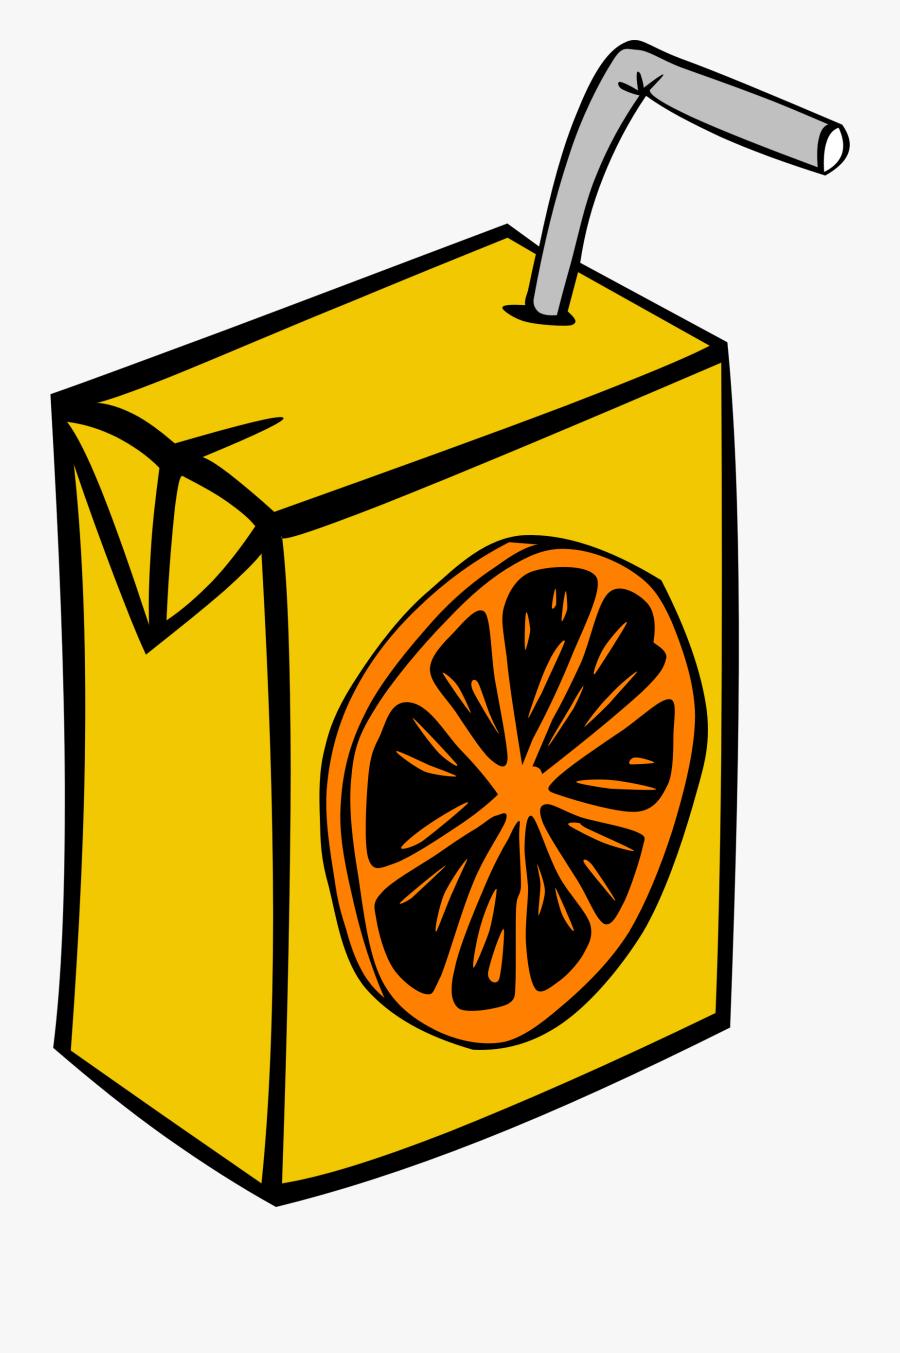 Drinks Clipart Fast Food - Orange Juice Box Clipart, Transparent Clipart